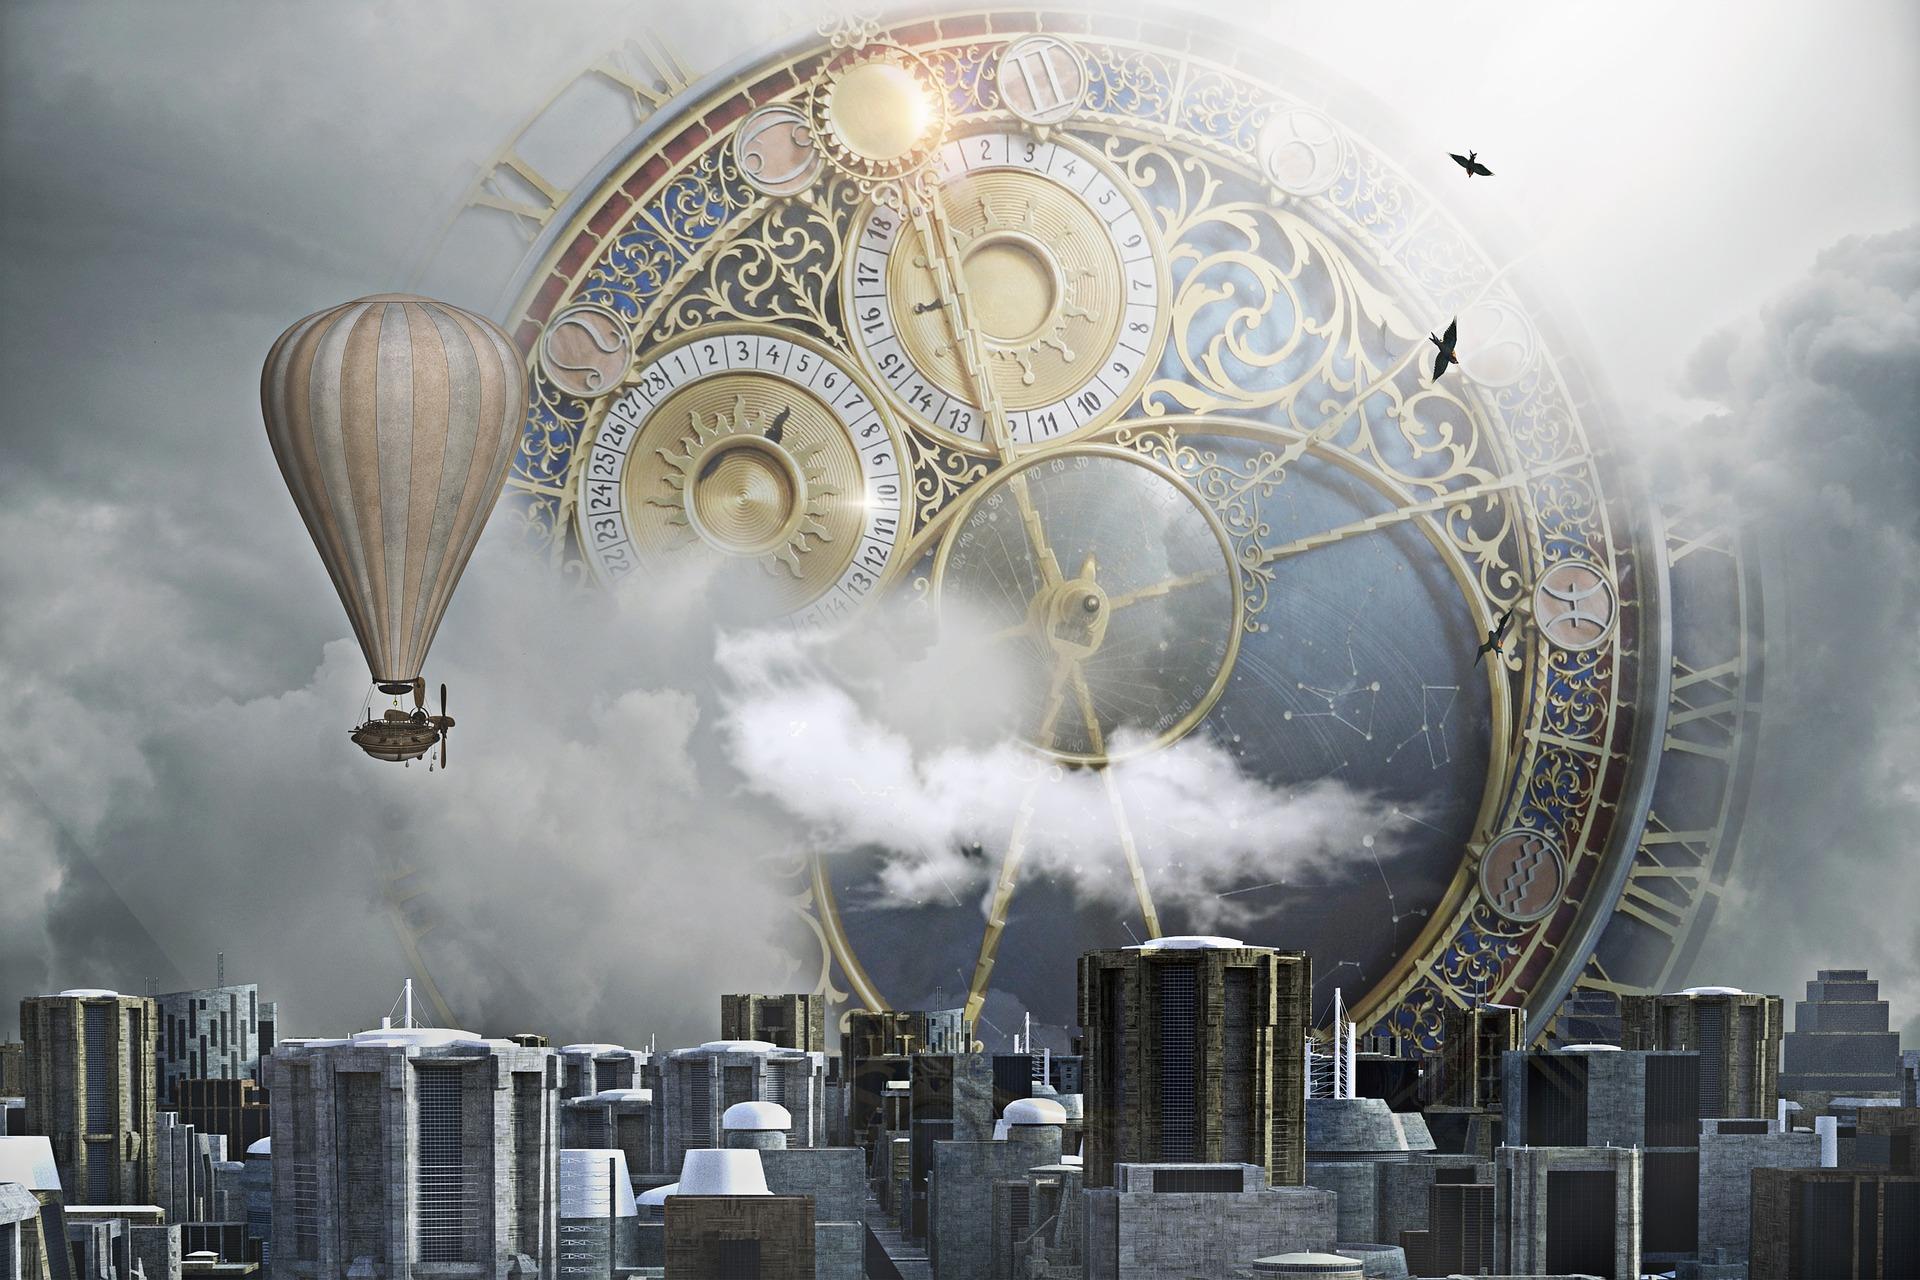 Sci-Fi fantasy clock